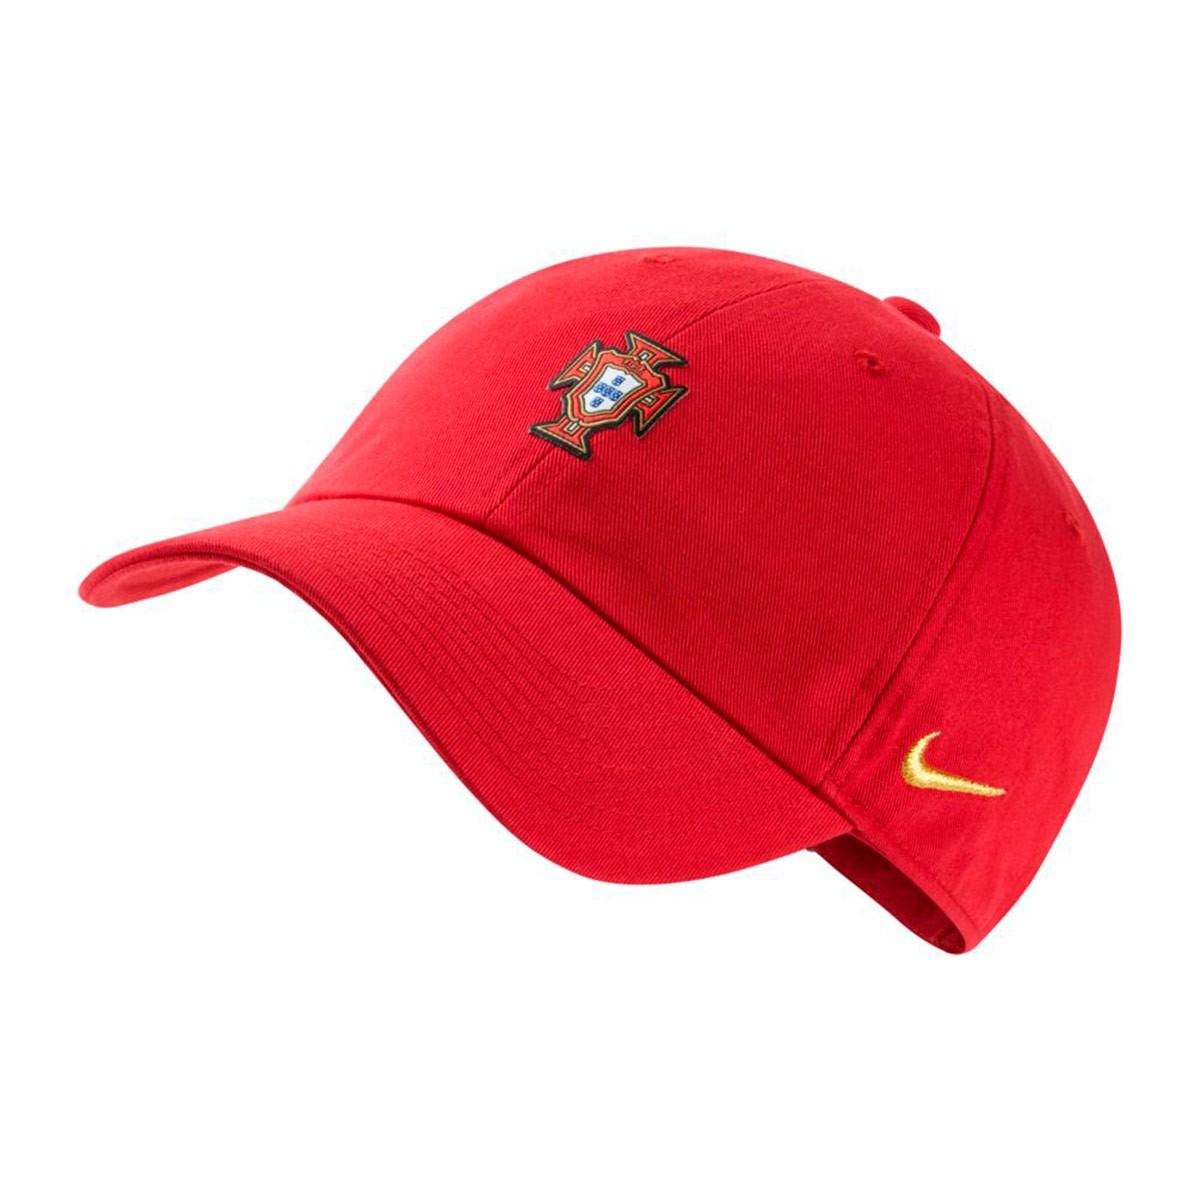 Cap Nike Portugal 2018-2019 Gym red-Metallic gold - Soloporteros es ... 58ac88e3b9f